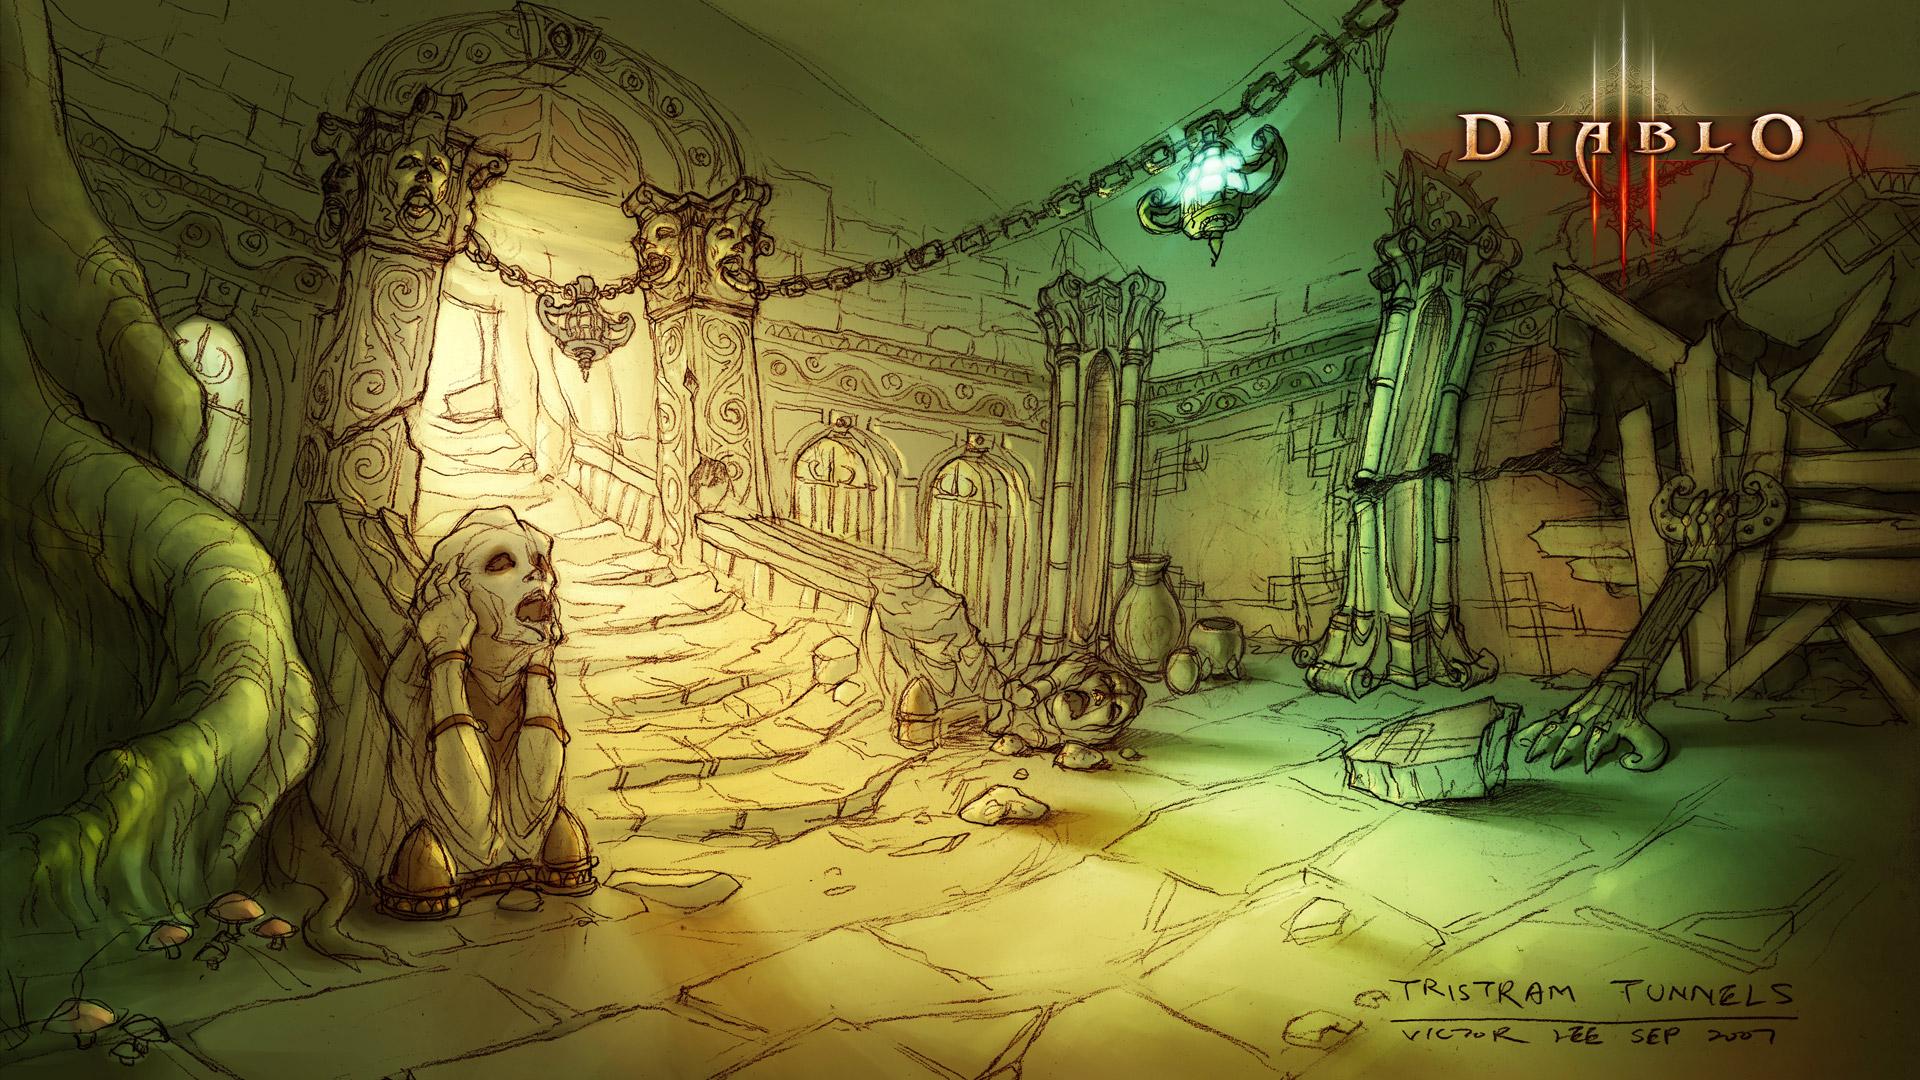 Diablo 3 wallpaper 35